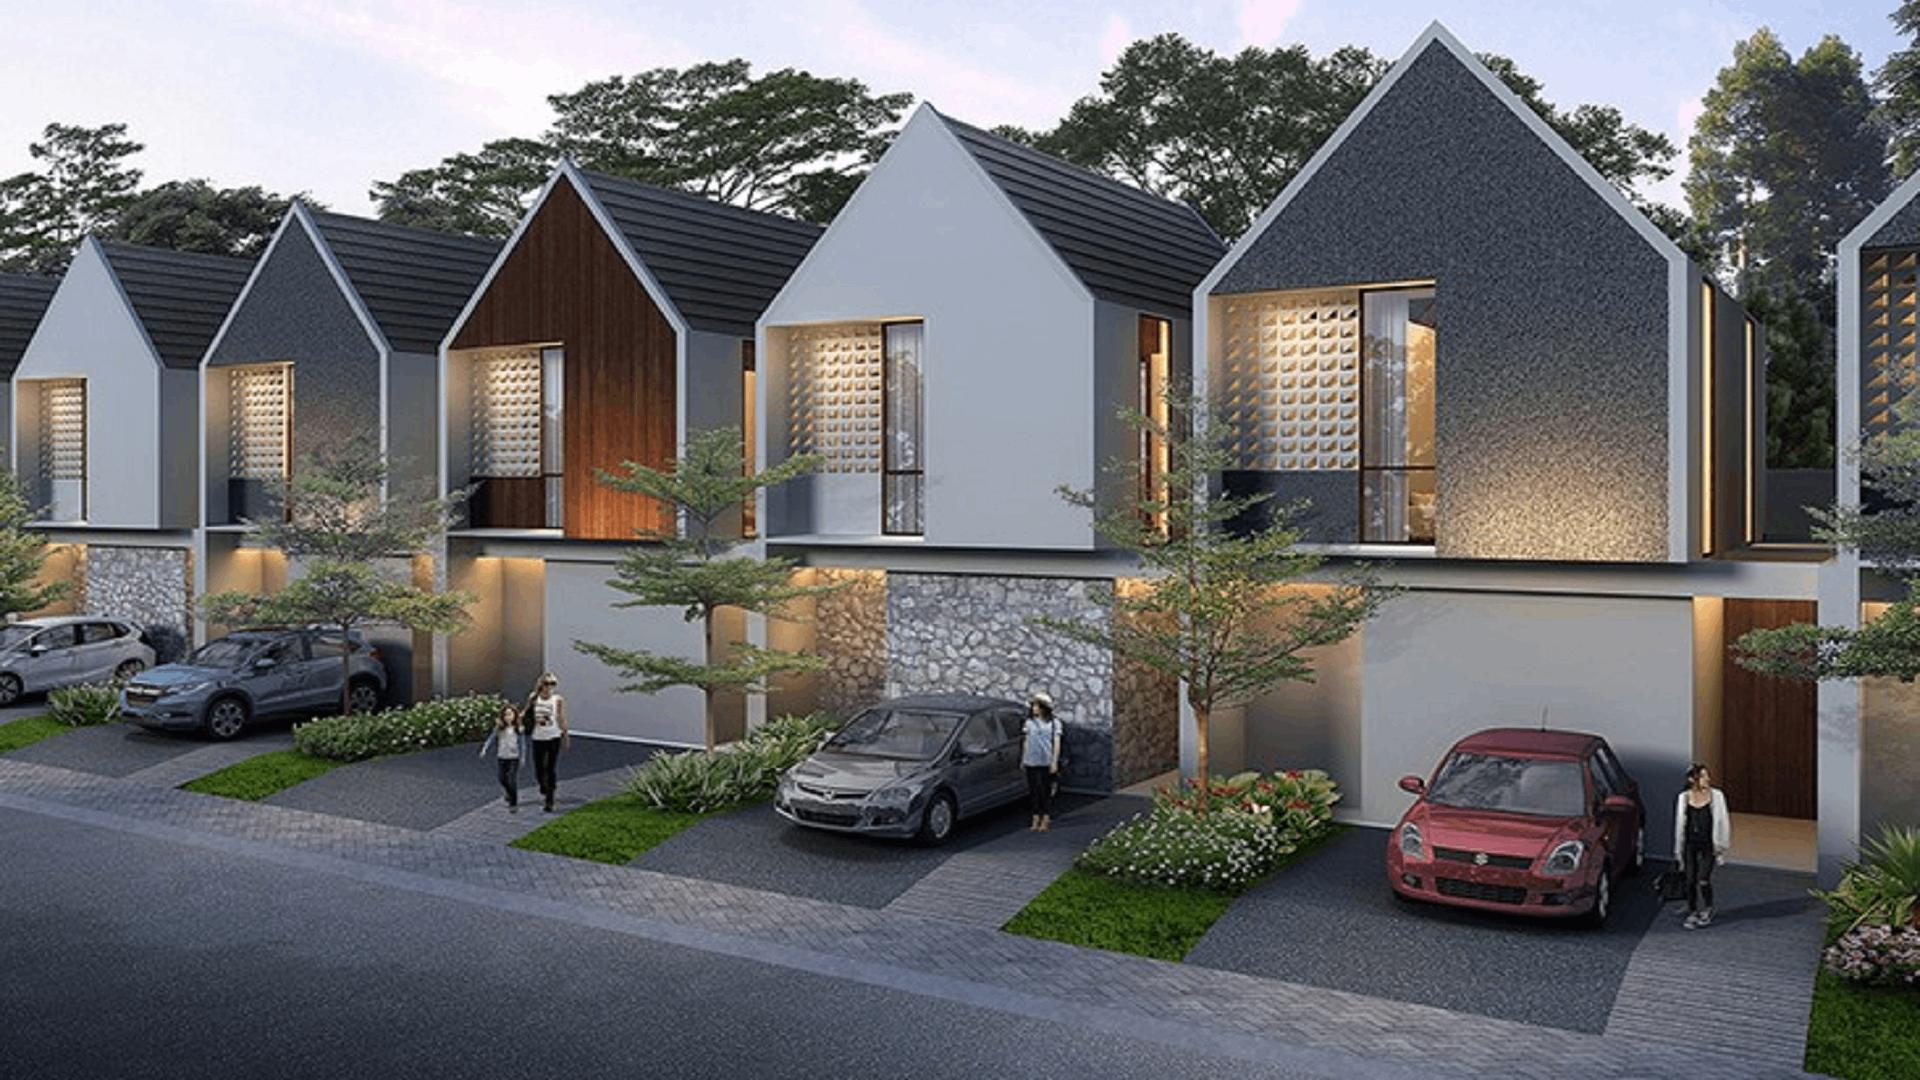 The Jivana Homes